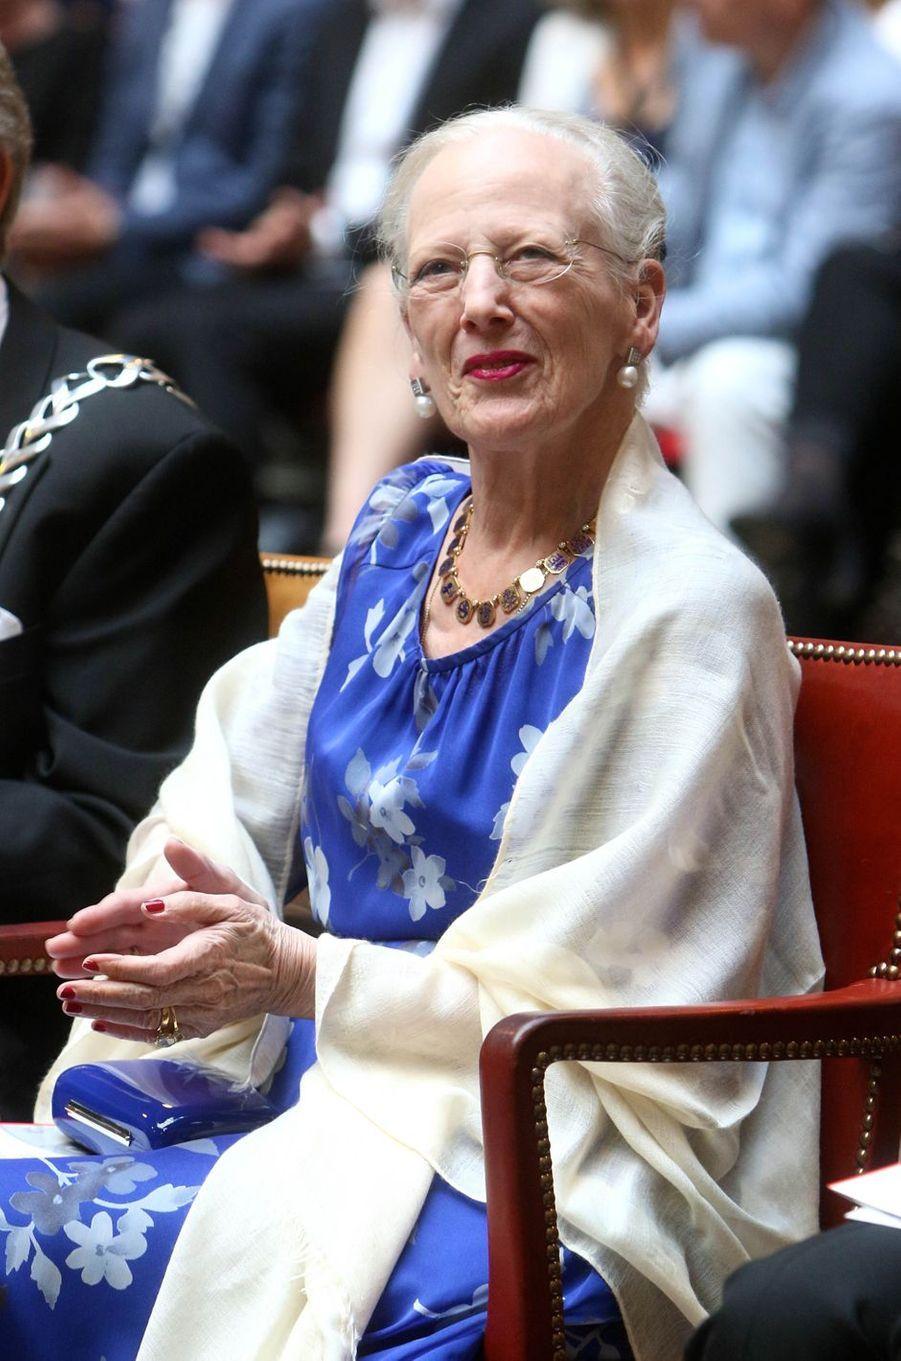 La reine Margrethe II de Danemark à Copenhague, le 15 mai 2018